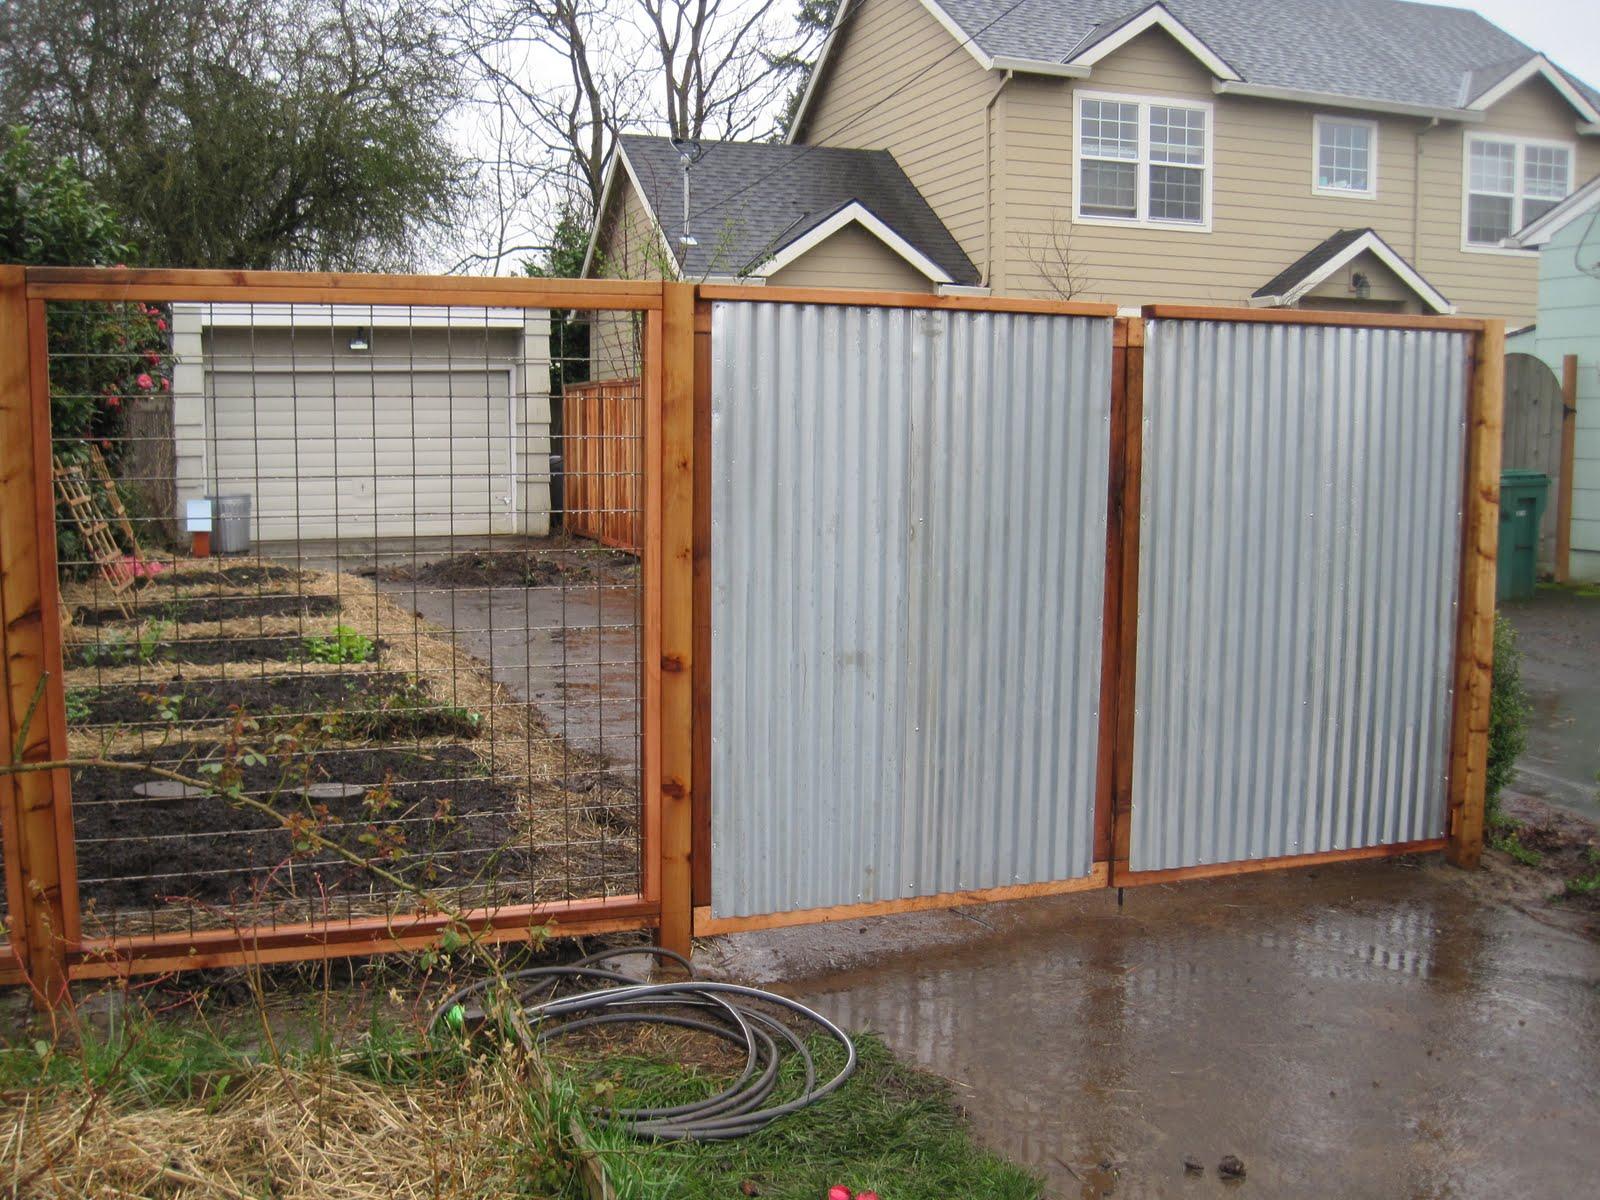 Aristata Land Arts Building Fences In The Rain